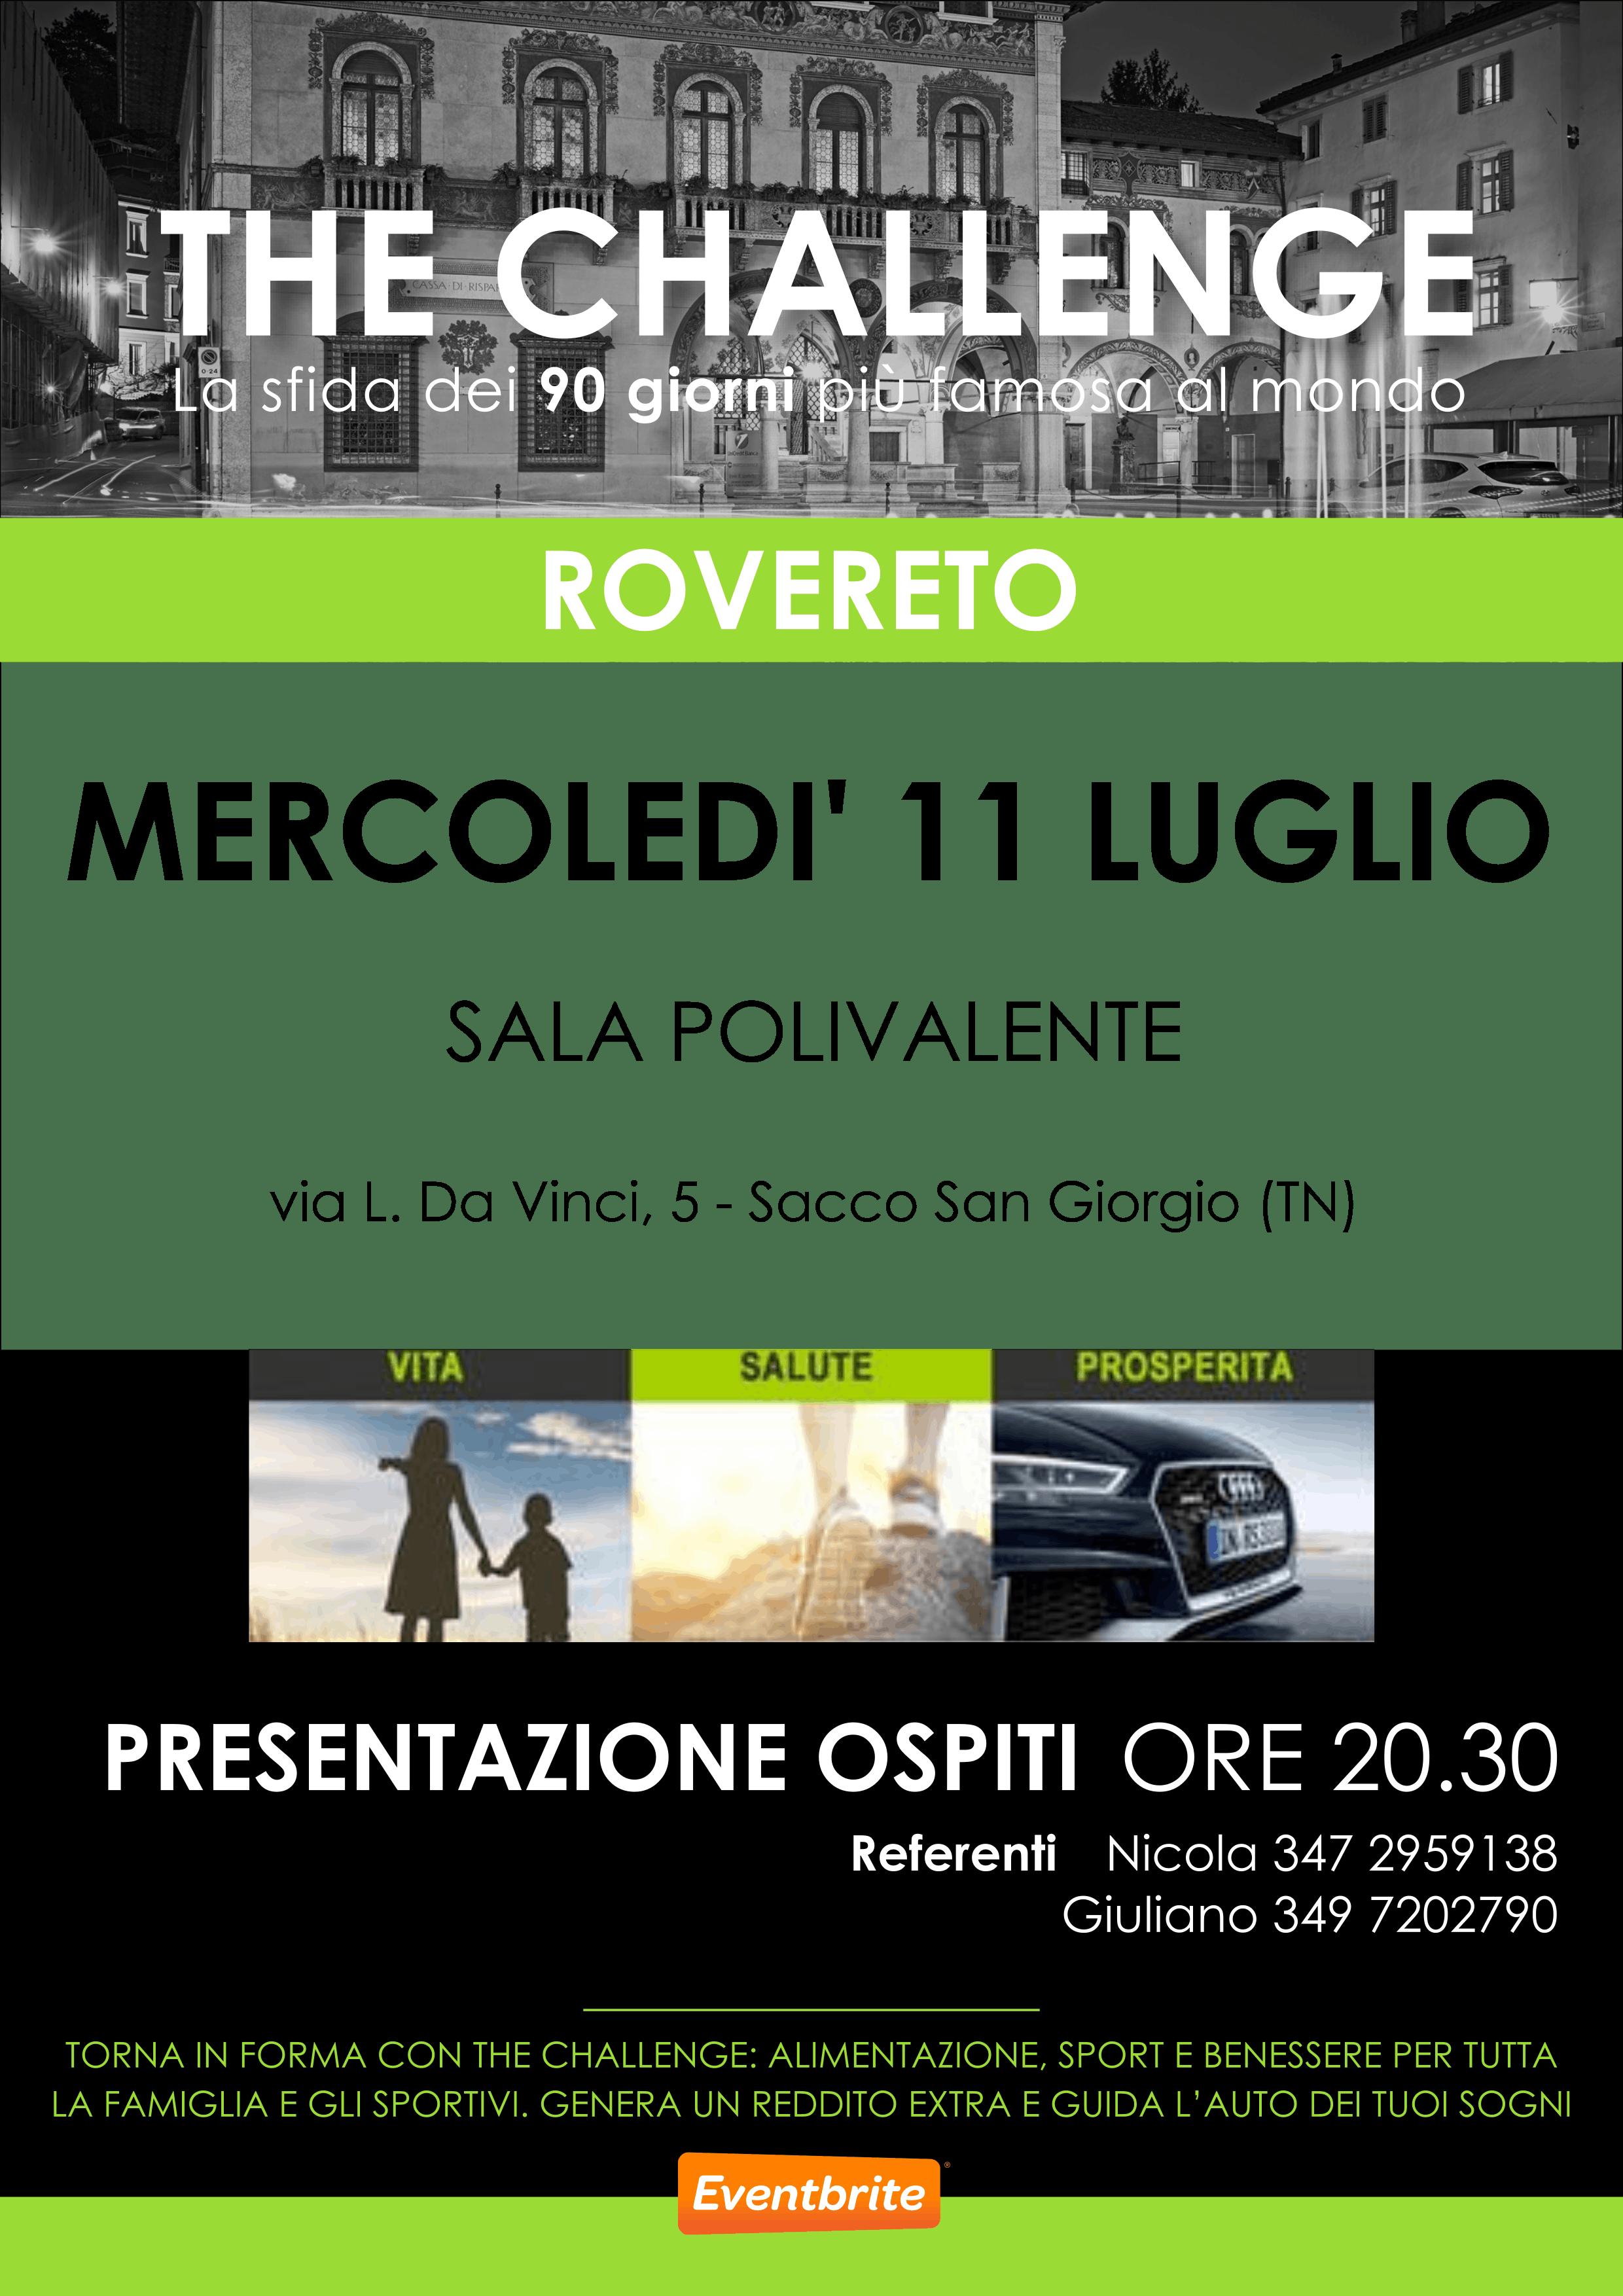 The CHALLENGE - Rovereto